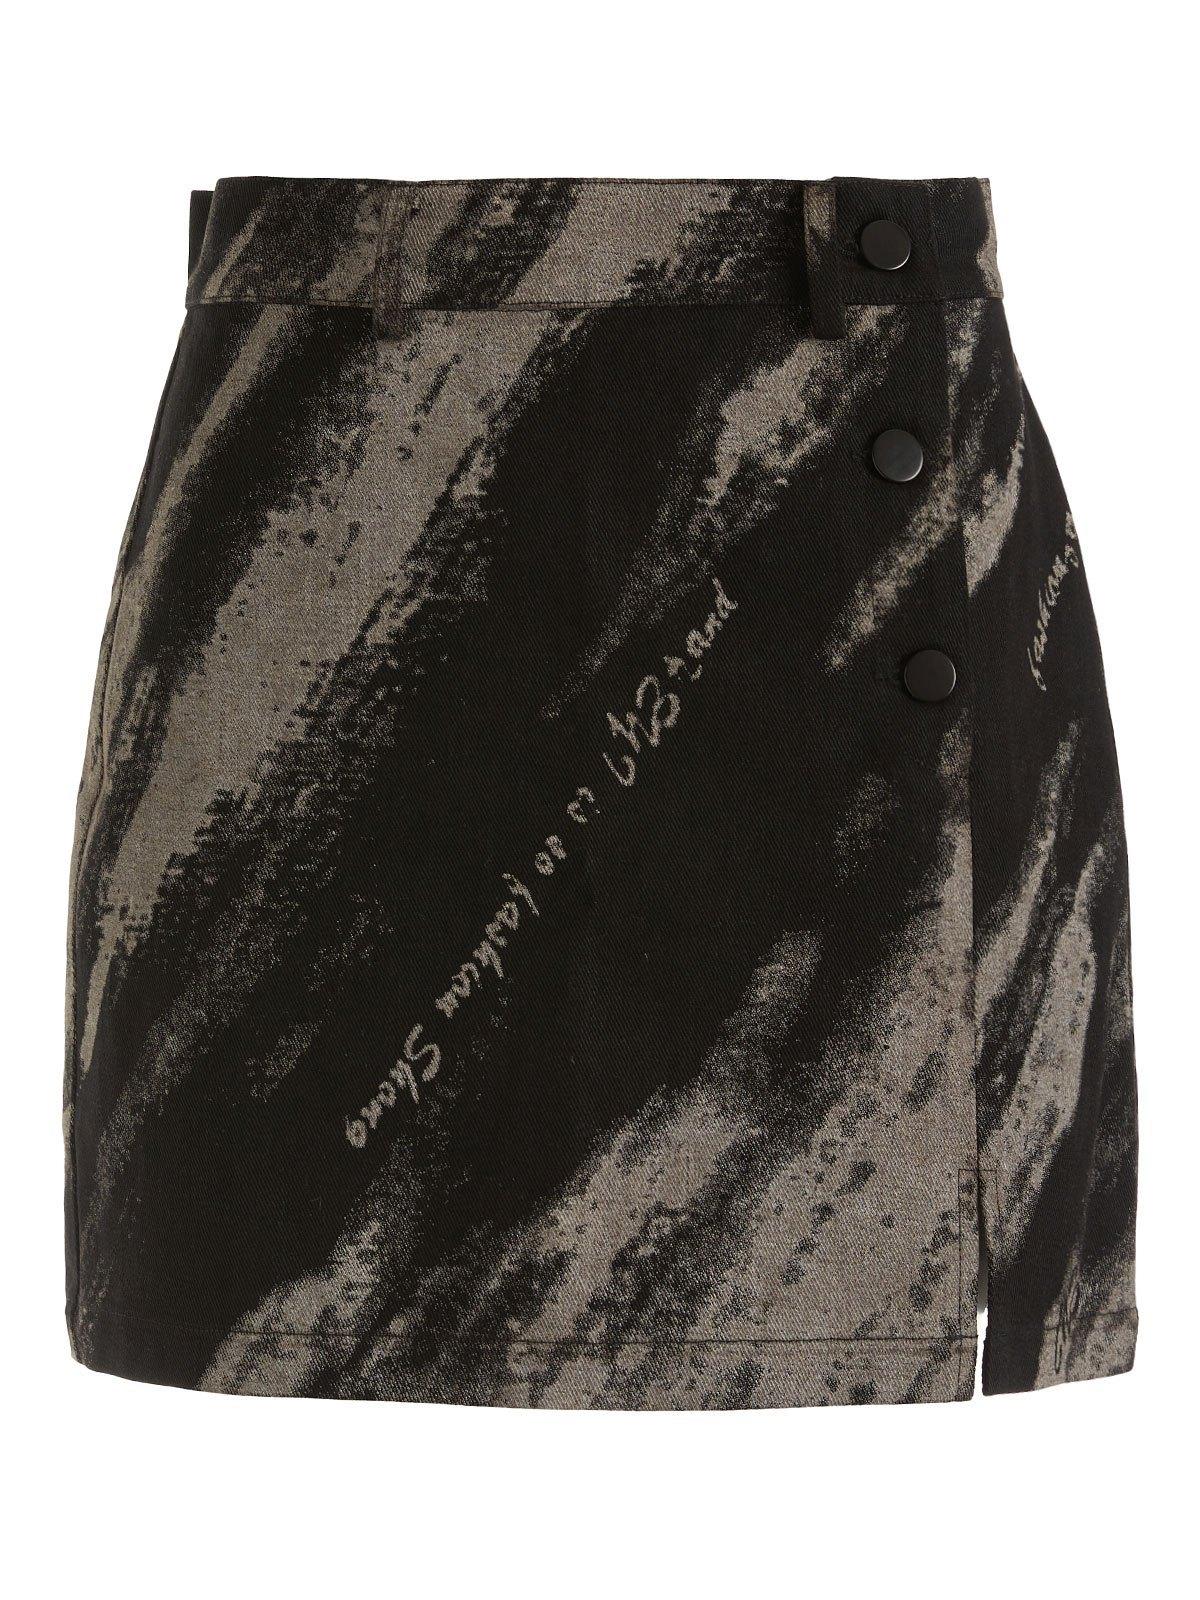 EMMIOL Tie Dye Buttoned Mini Skirt - Black M